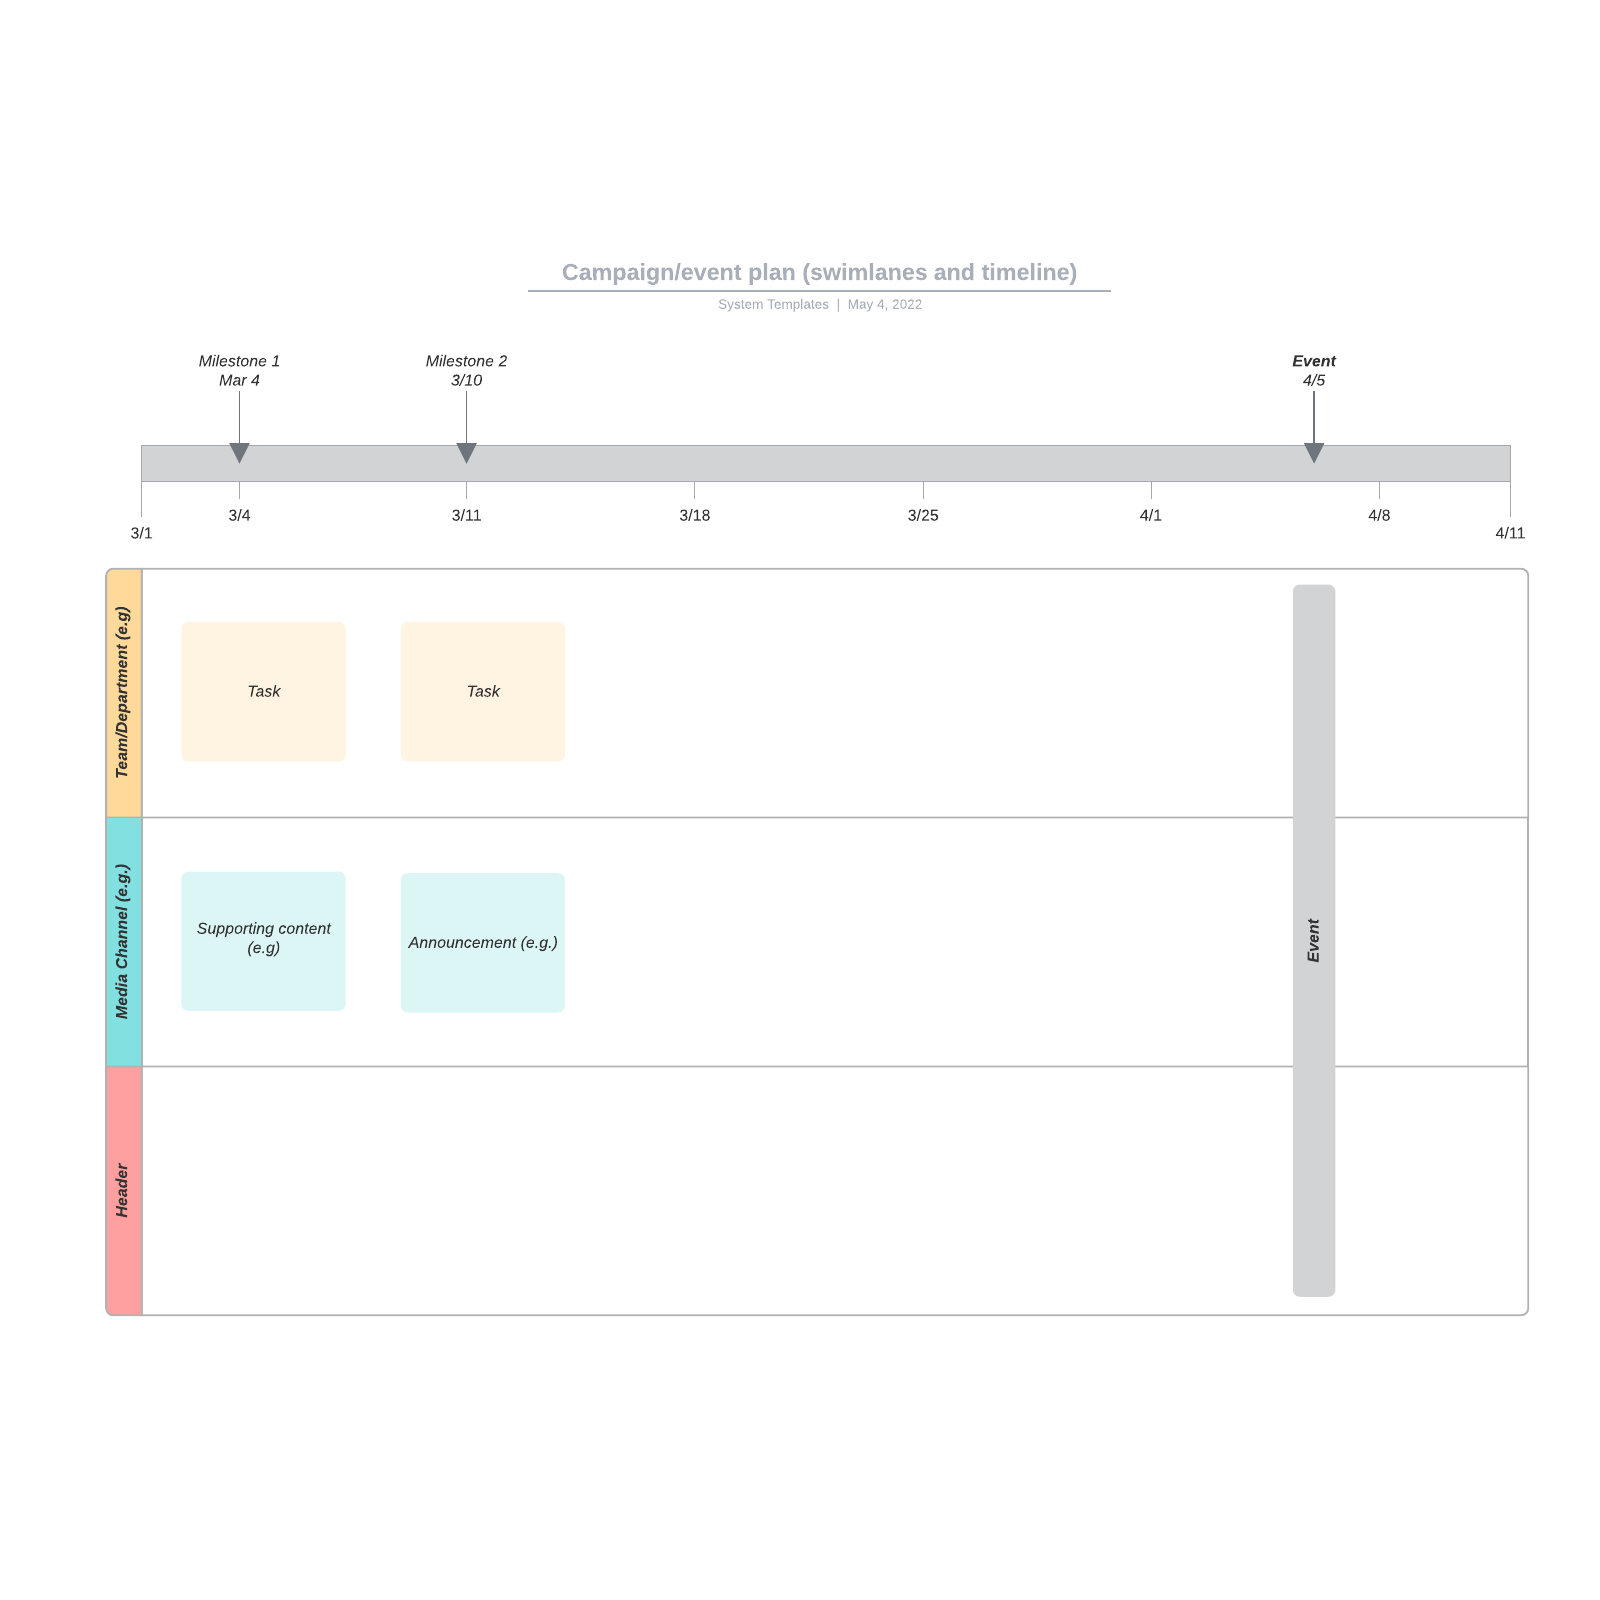 Campaign/event plan (swimlanes and timeline)